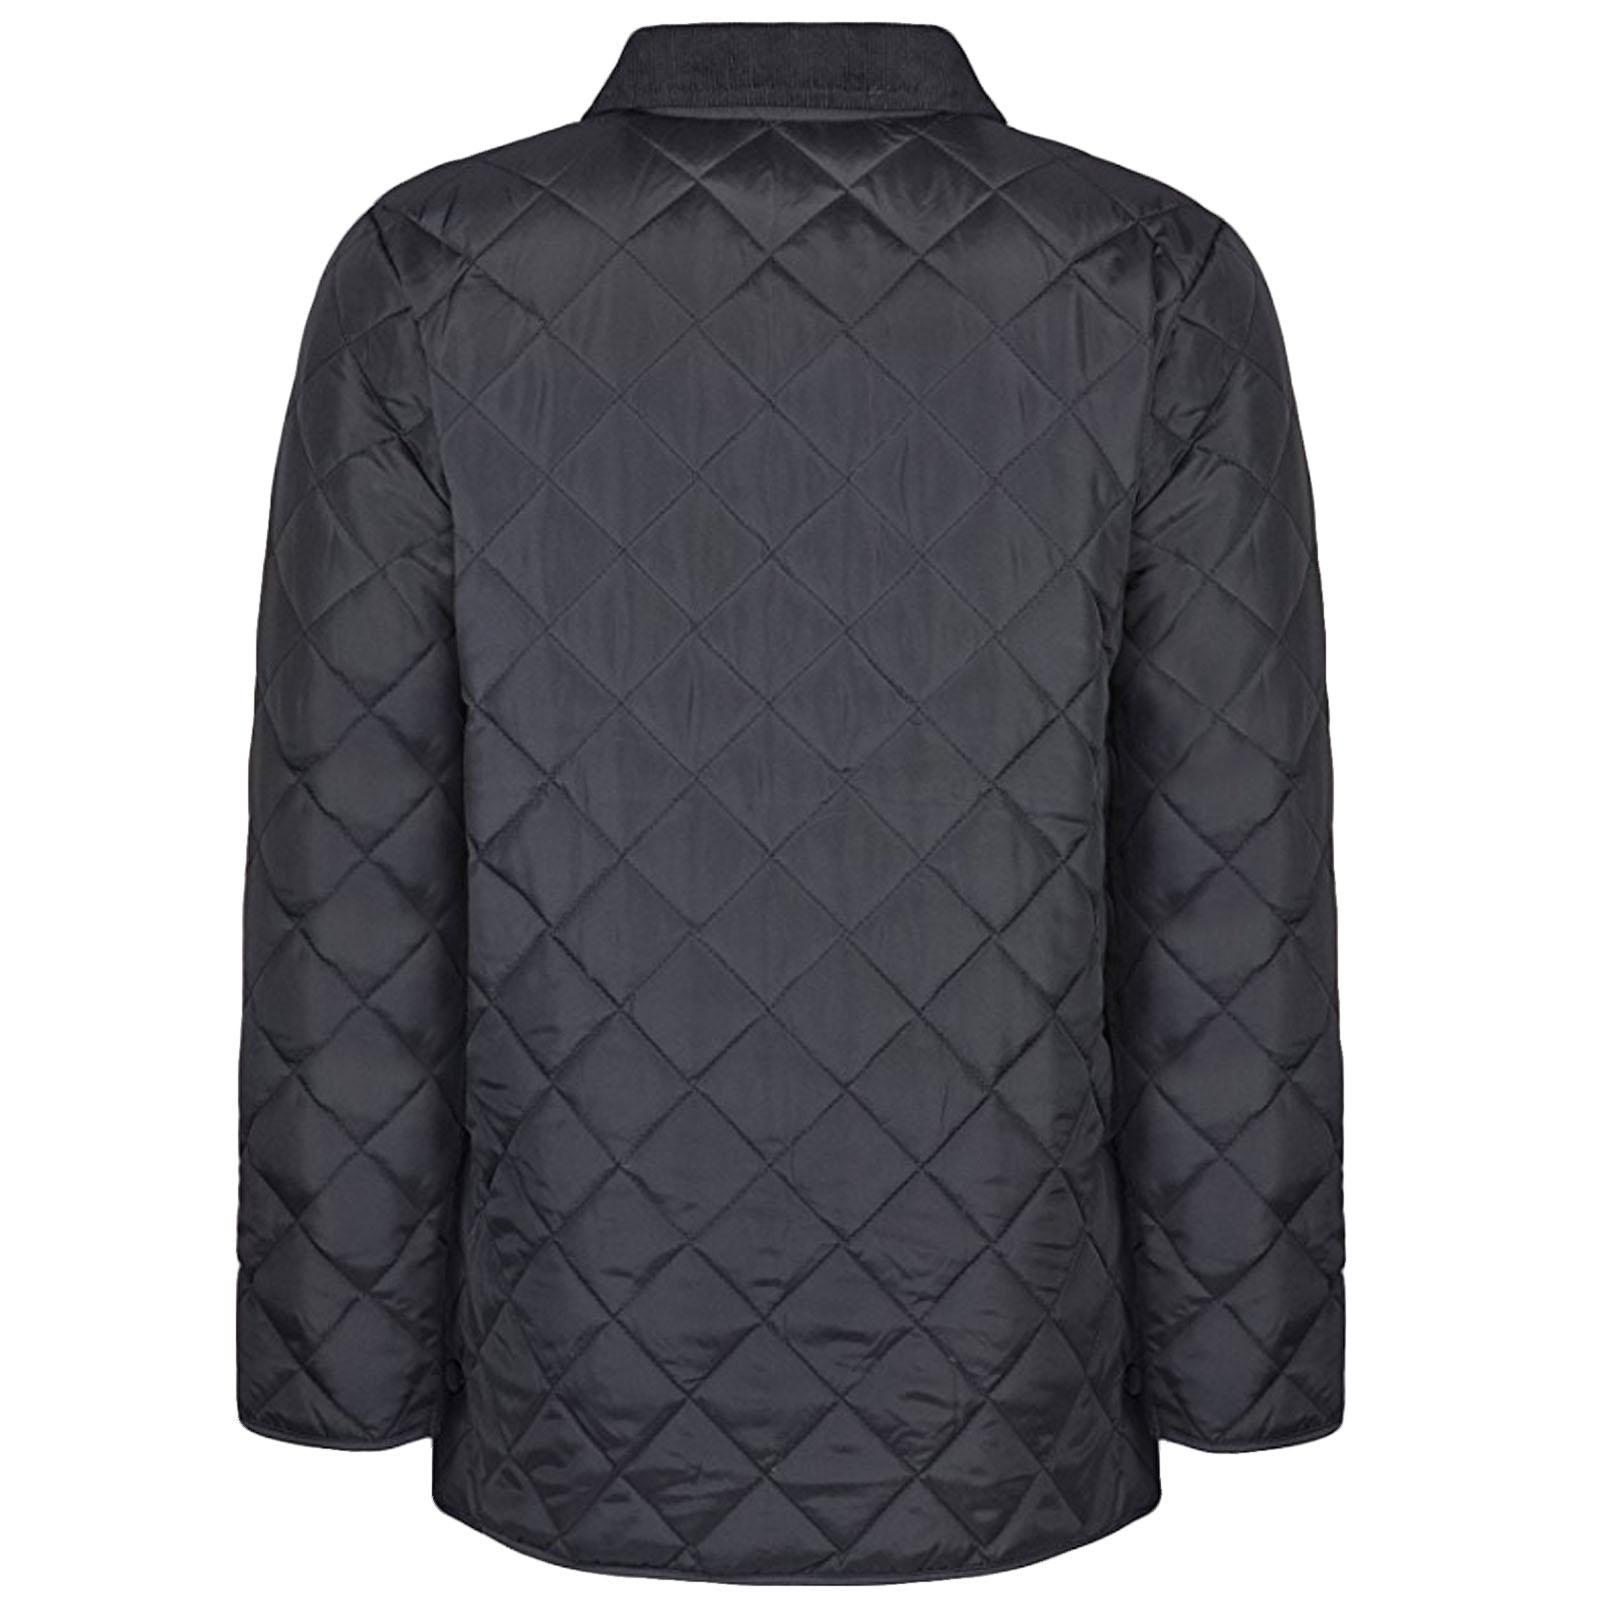 Soul Star Mens Diamond Quilted Jacket Cord Collar Popper Buttoned ... : diamond quilt jacket - Adamdwight.com